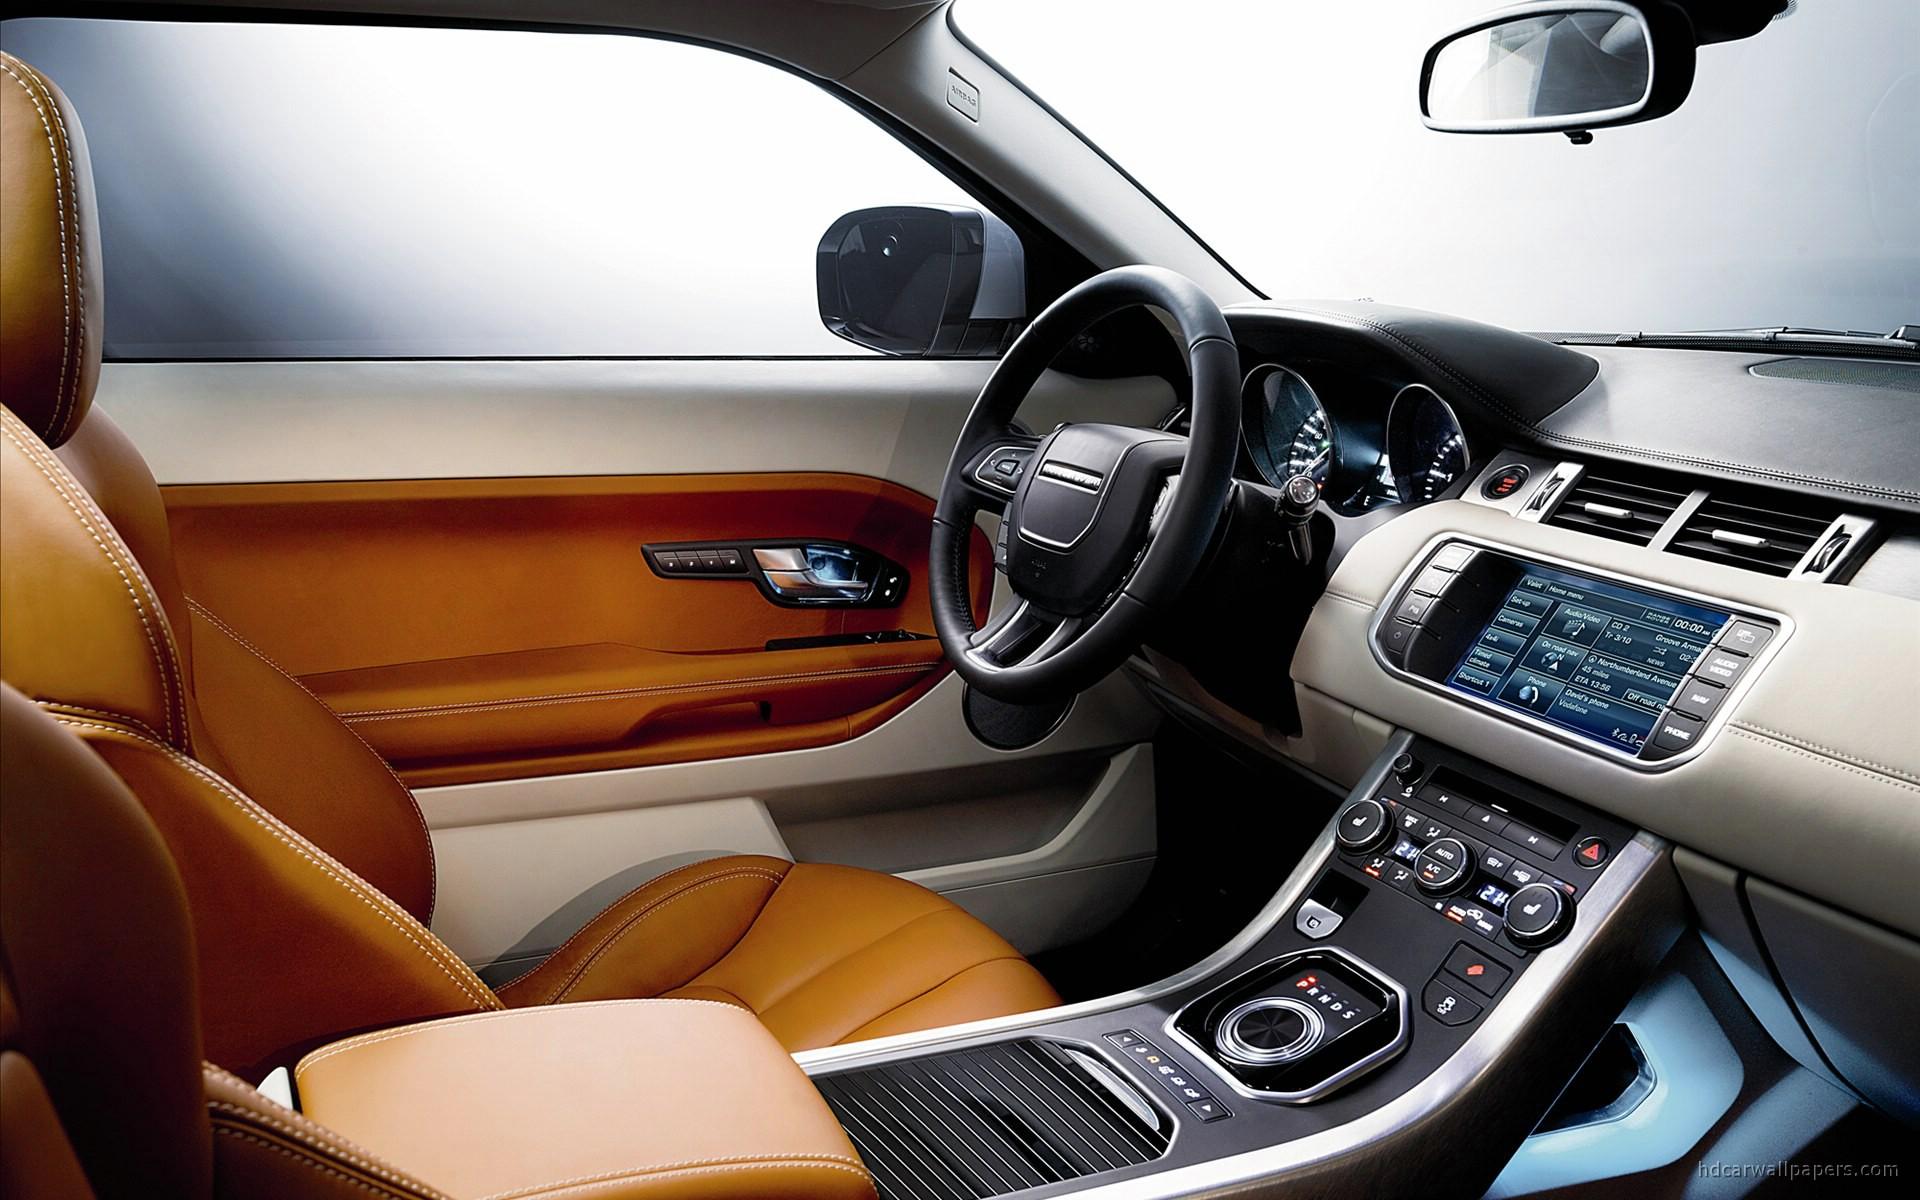 2011 Range Rover Evoque Interior Wallpaper